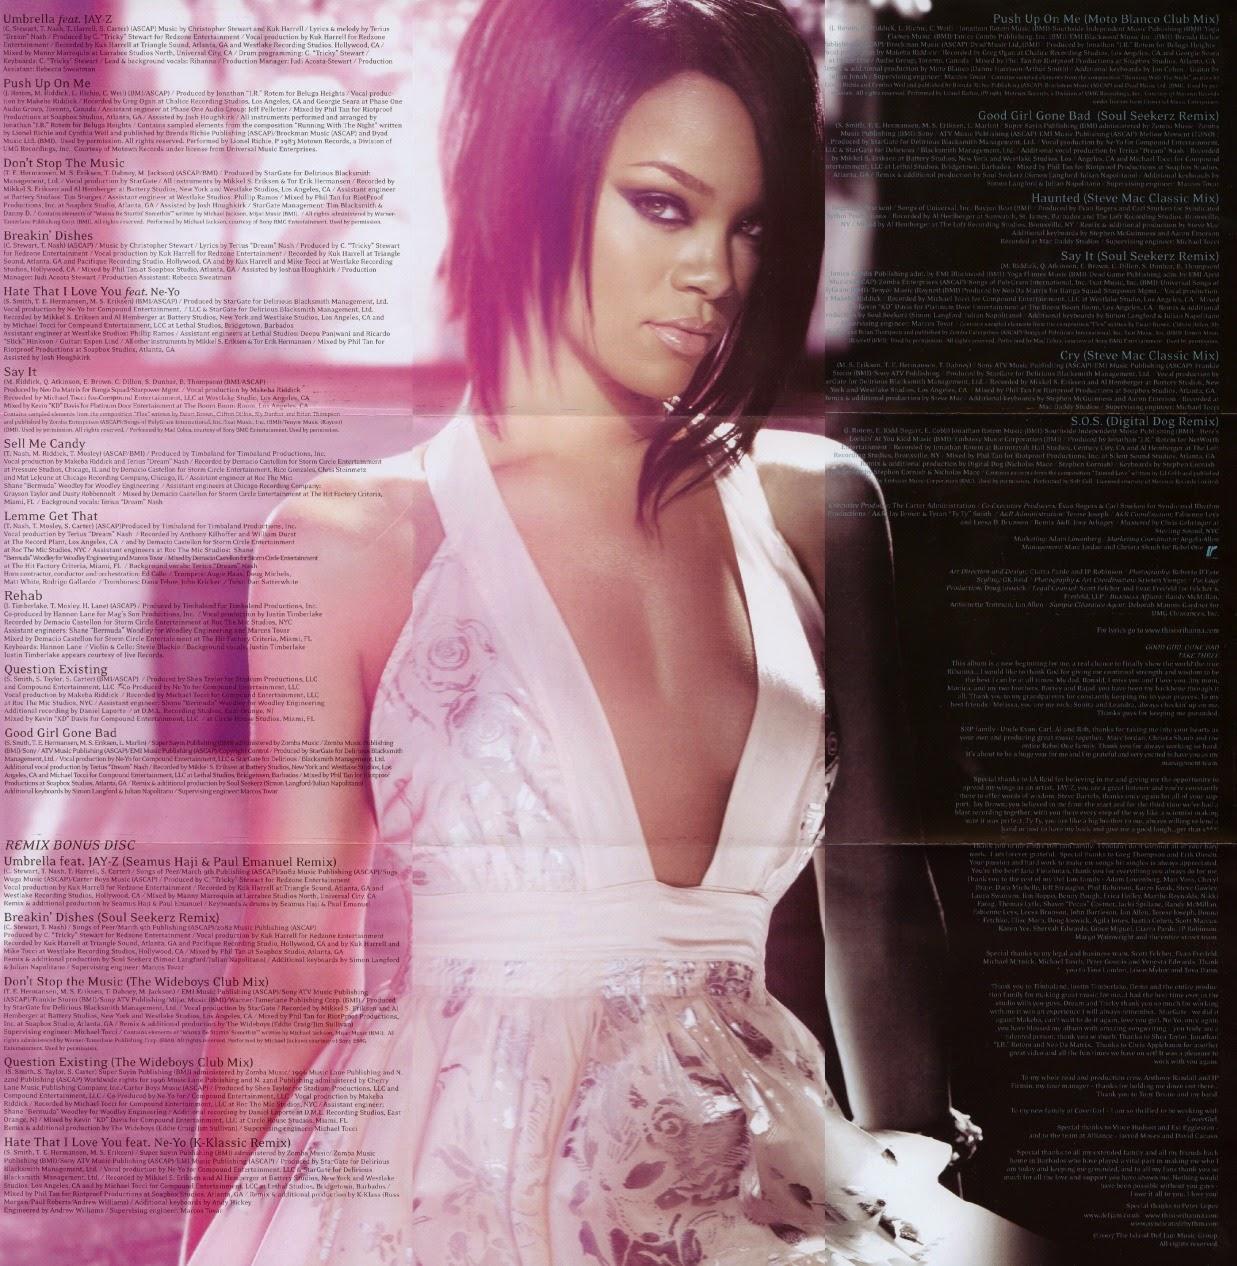 Rihanna-Good Girl Gone Bad The Remixes-2009-RiHANNA Download